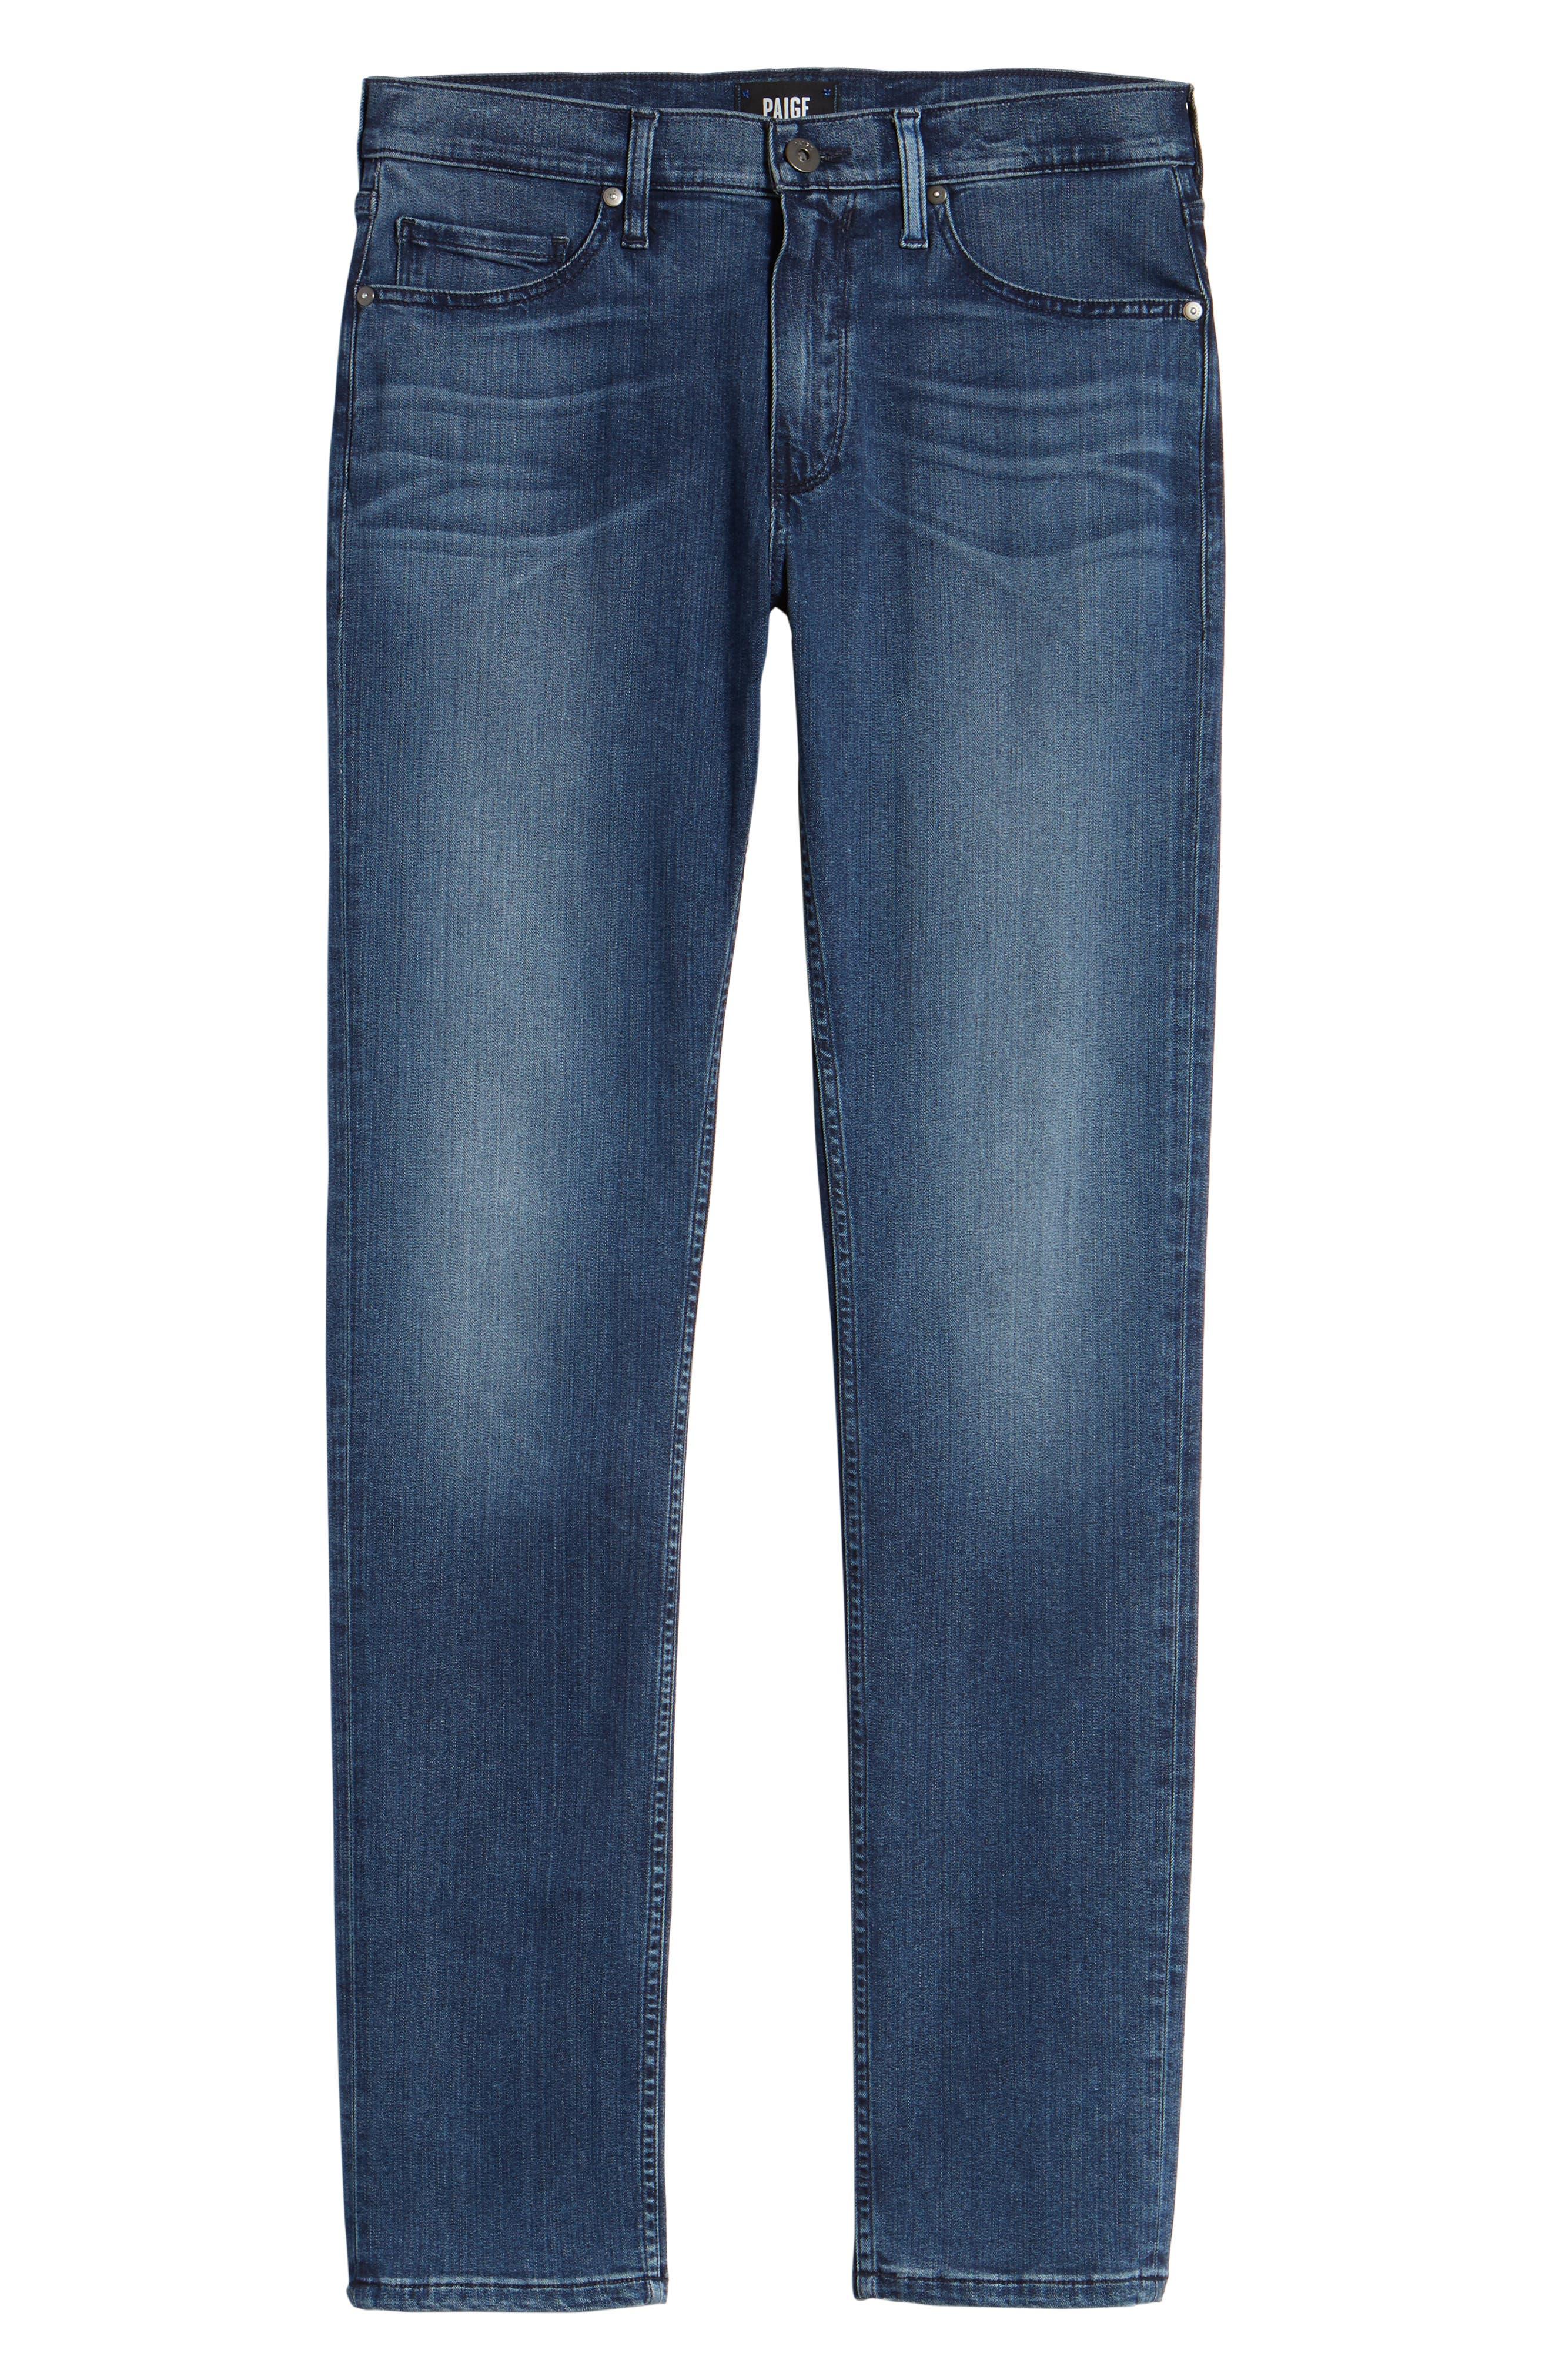 Lennox Slim Fit Jeans,                             Alternate thumbnail 6, color,                             400